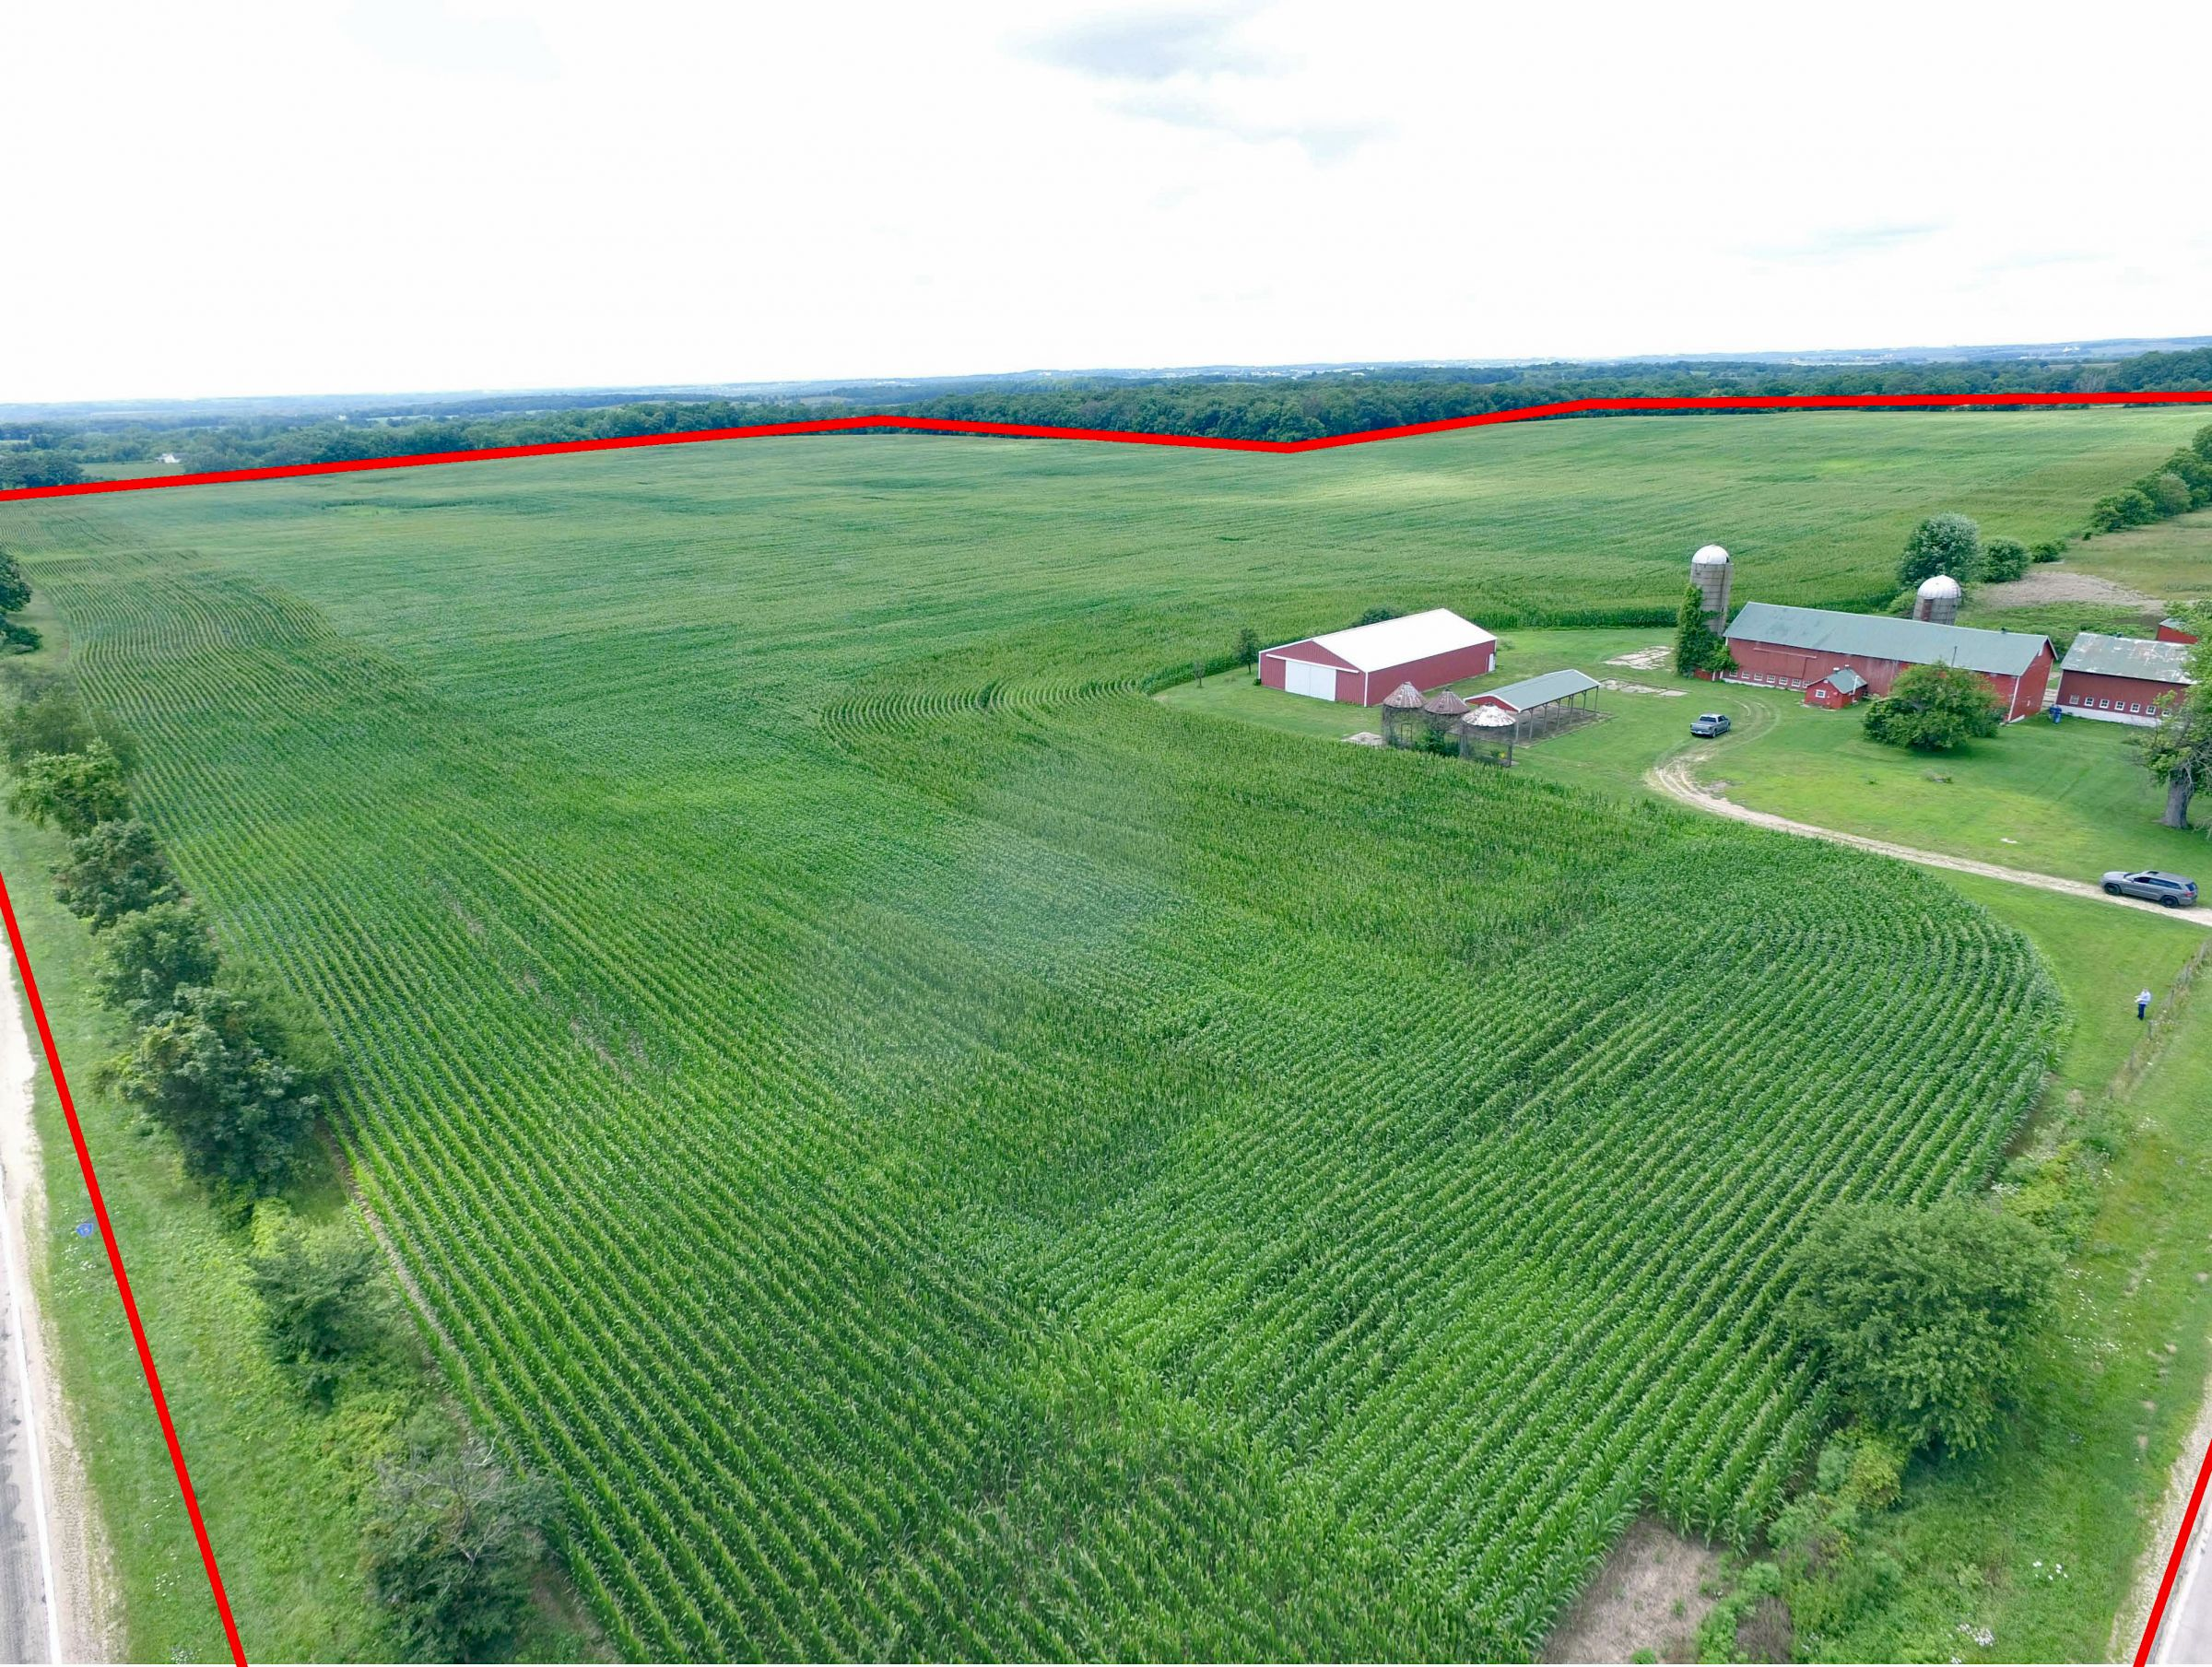 land-winnebago-county-illinois-127-acres-listing-number-15094-11-2020-08-03-160436.jpg